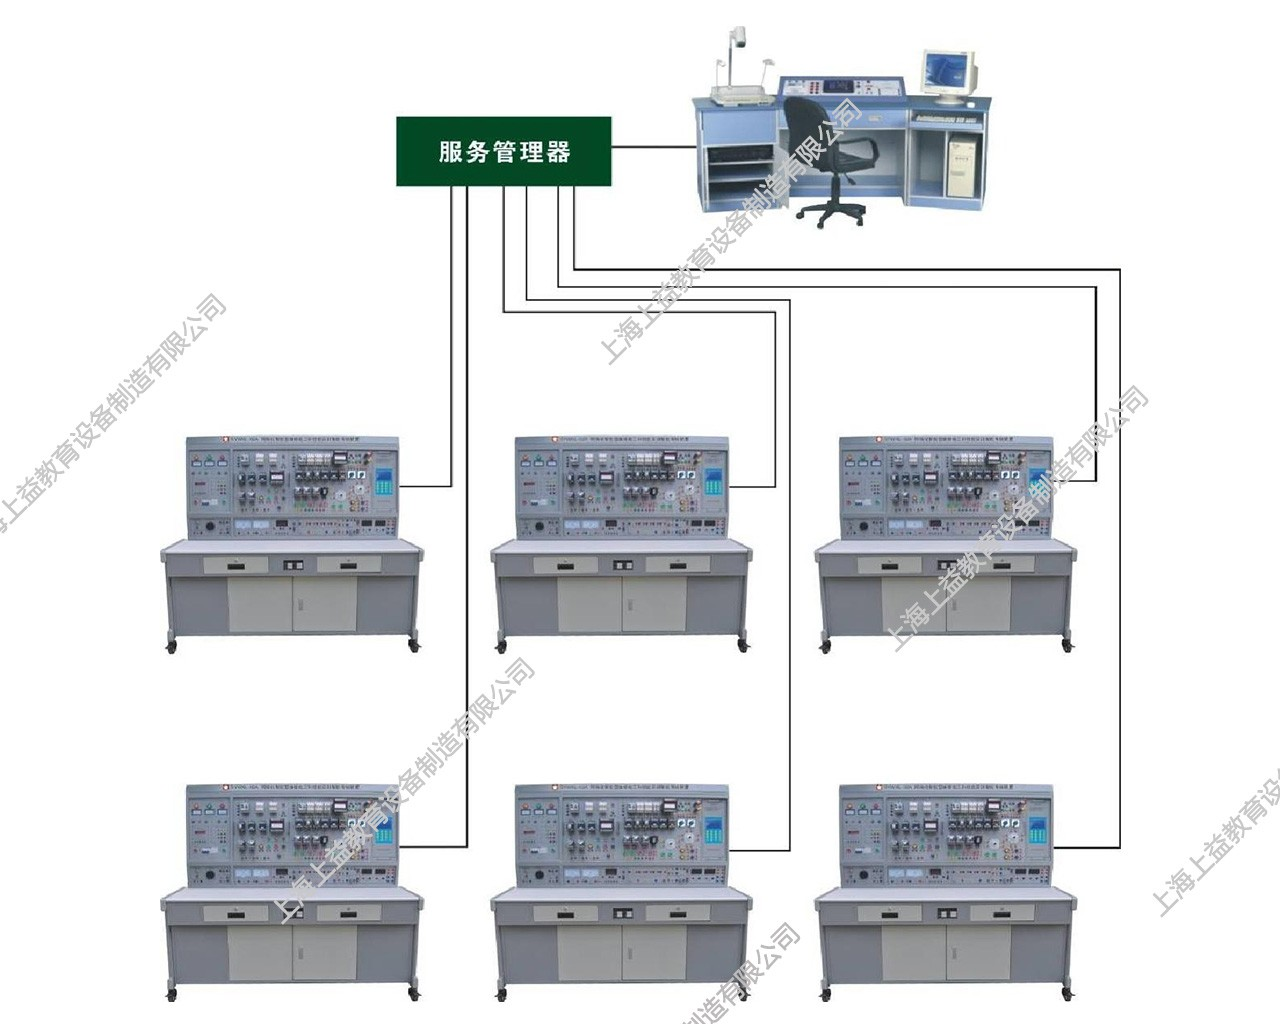 SYWXL-02B网络化智能型维修电工电气控制技能wwwlehu8vip智能lehu68vip装置